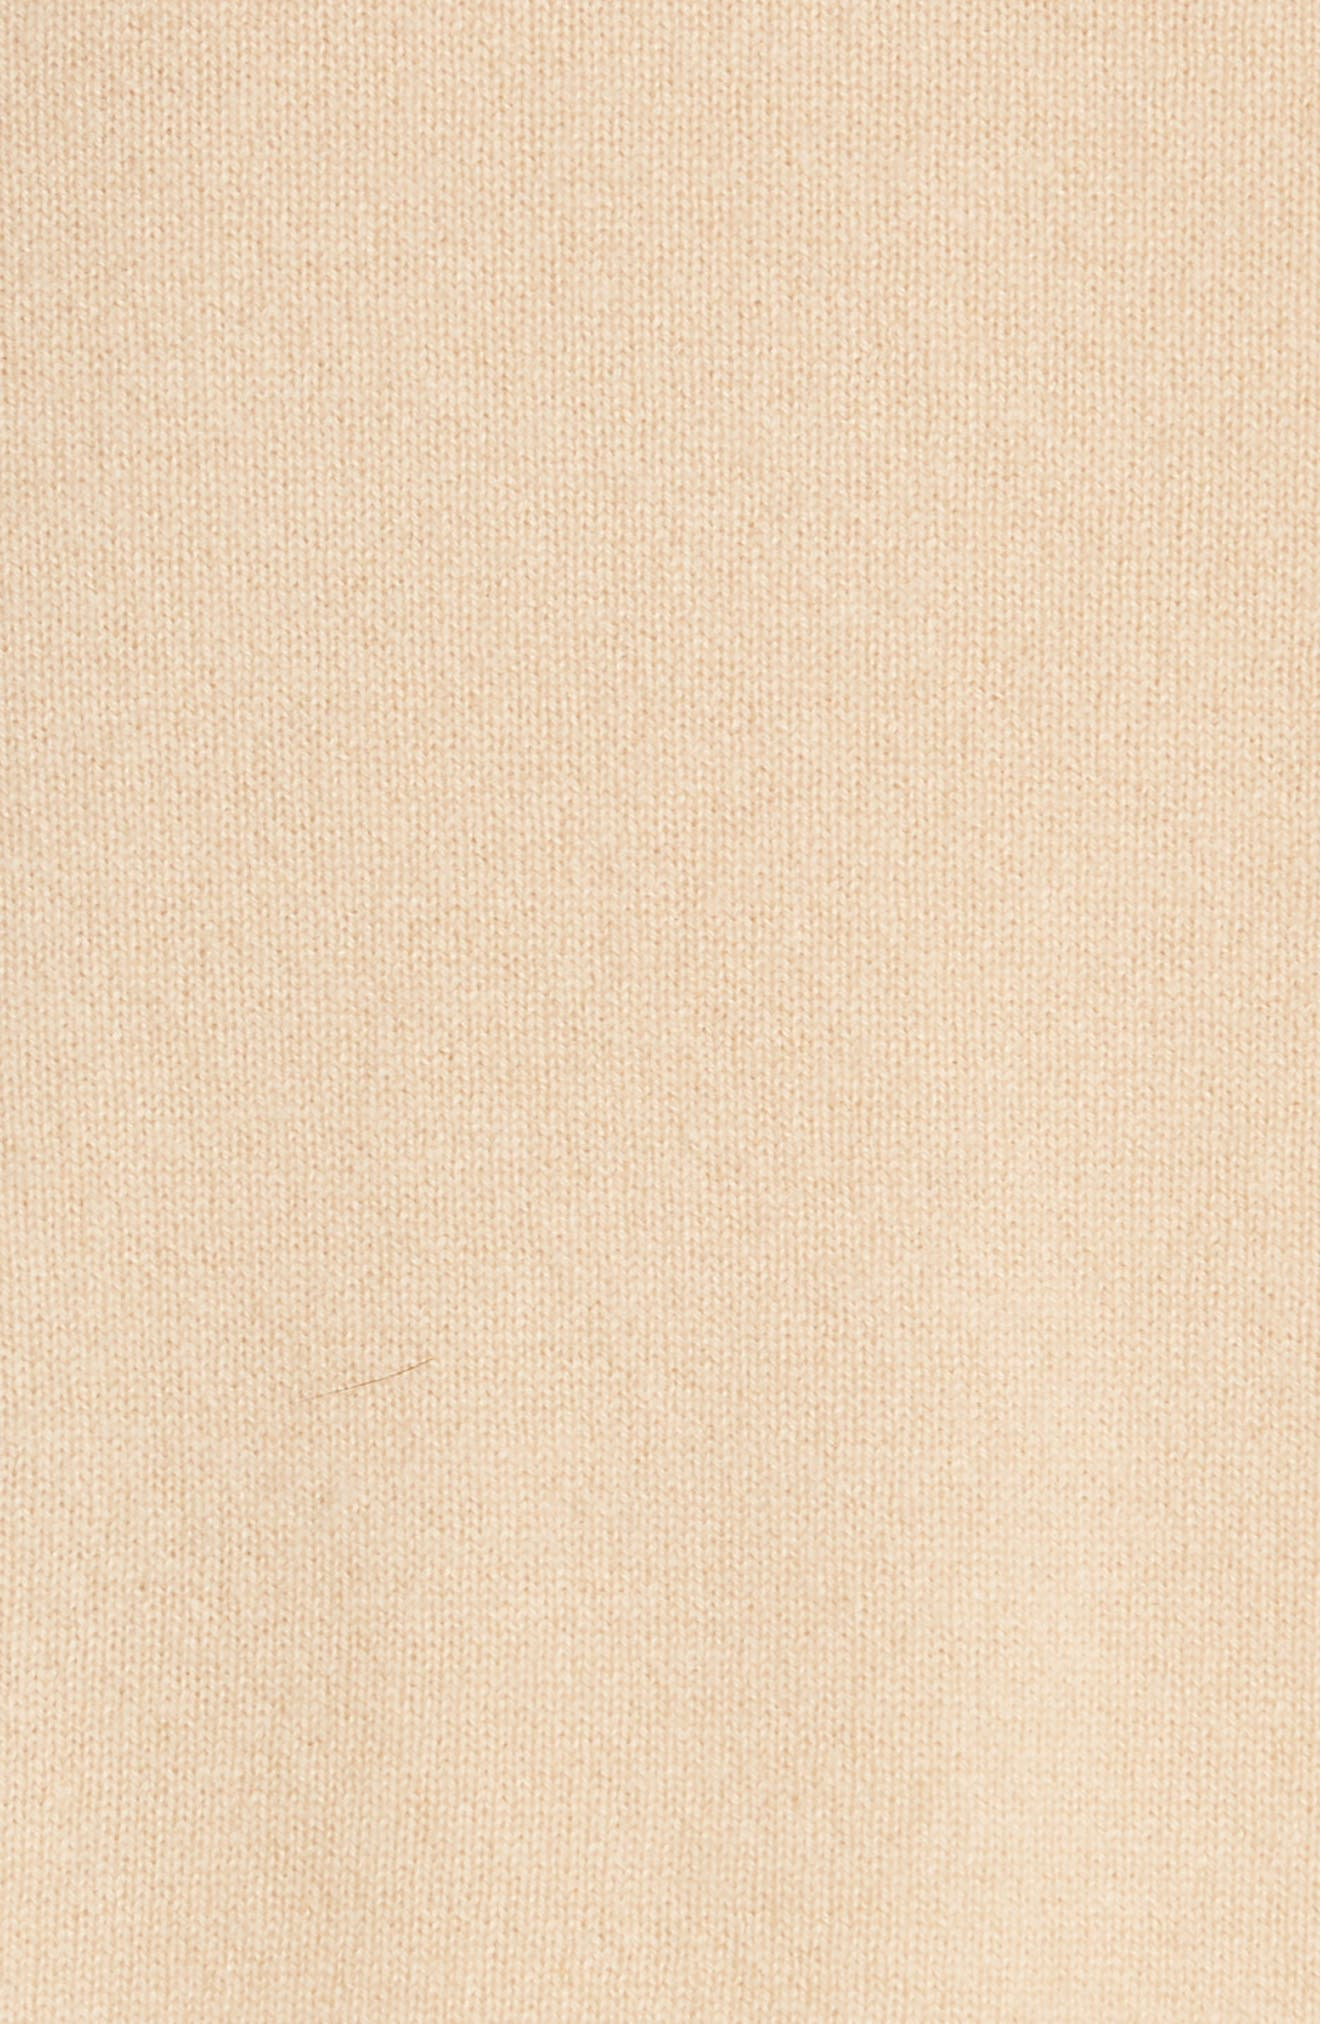 Side Cinch Cashmere Crewneck Sweater,                             Alternate thumbnail 5, color,                             293